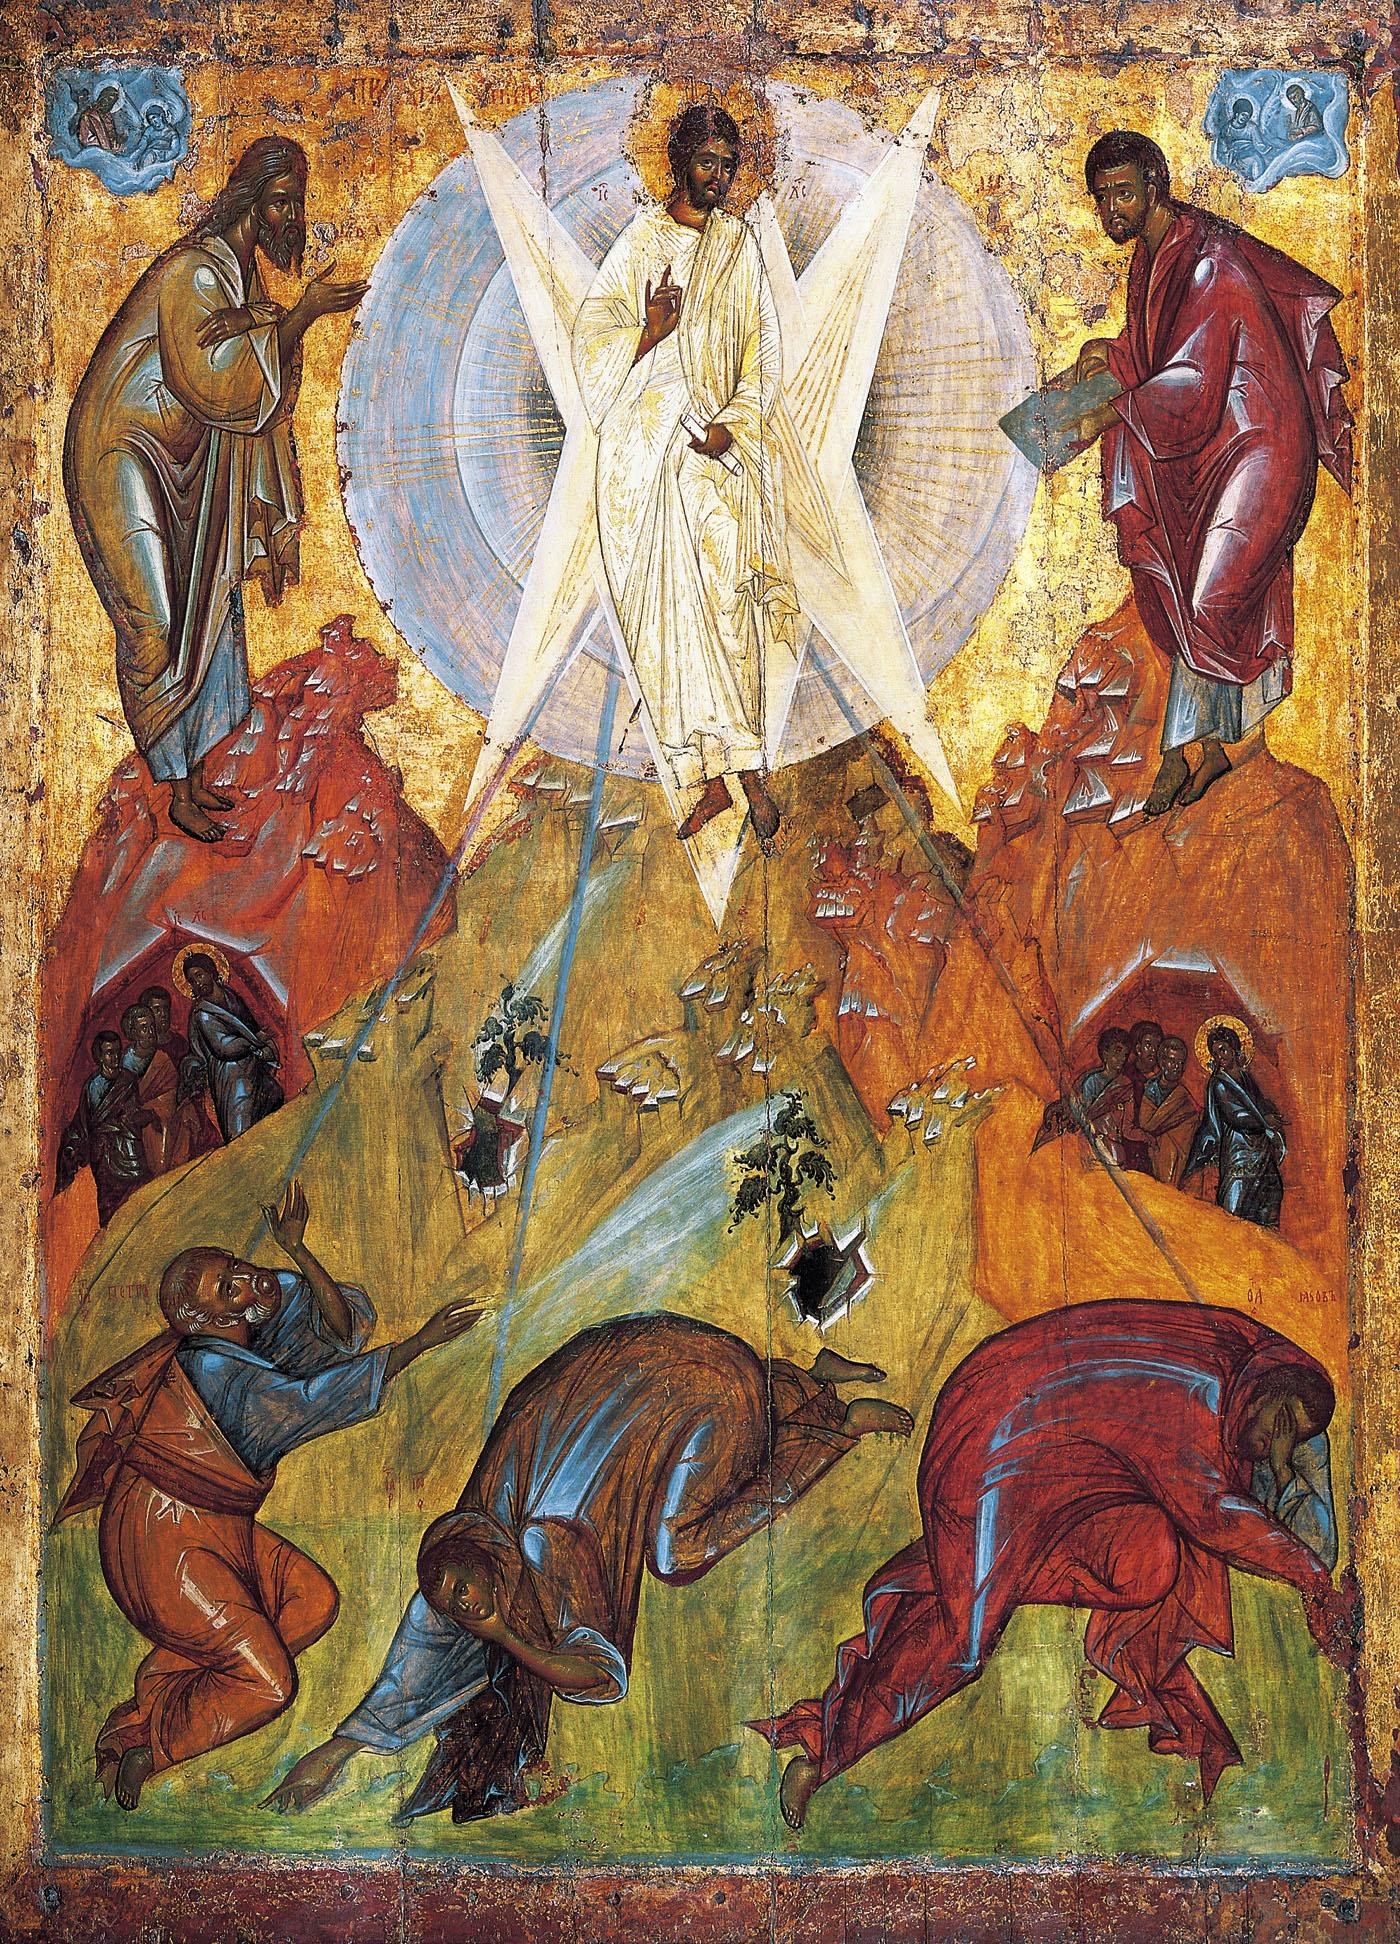 Transfiguration of Jesus in Christian art - Wikipedia